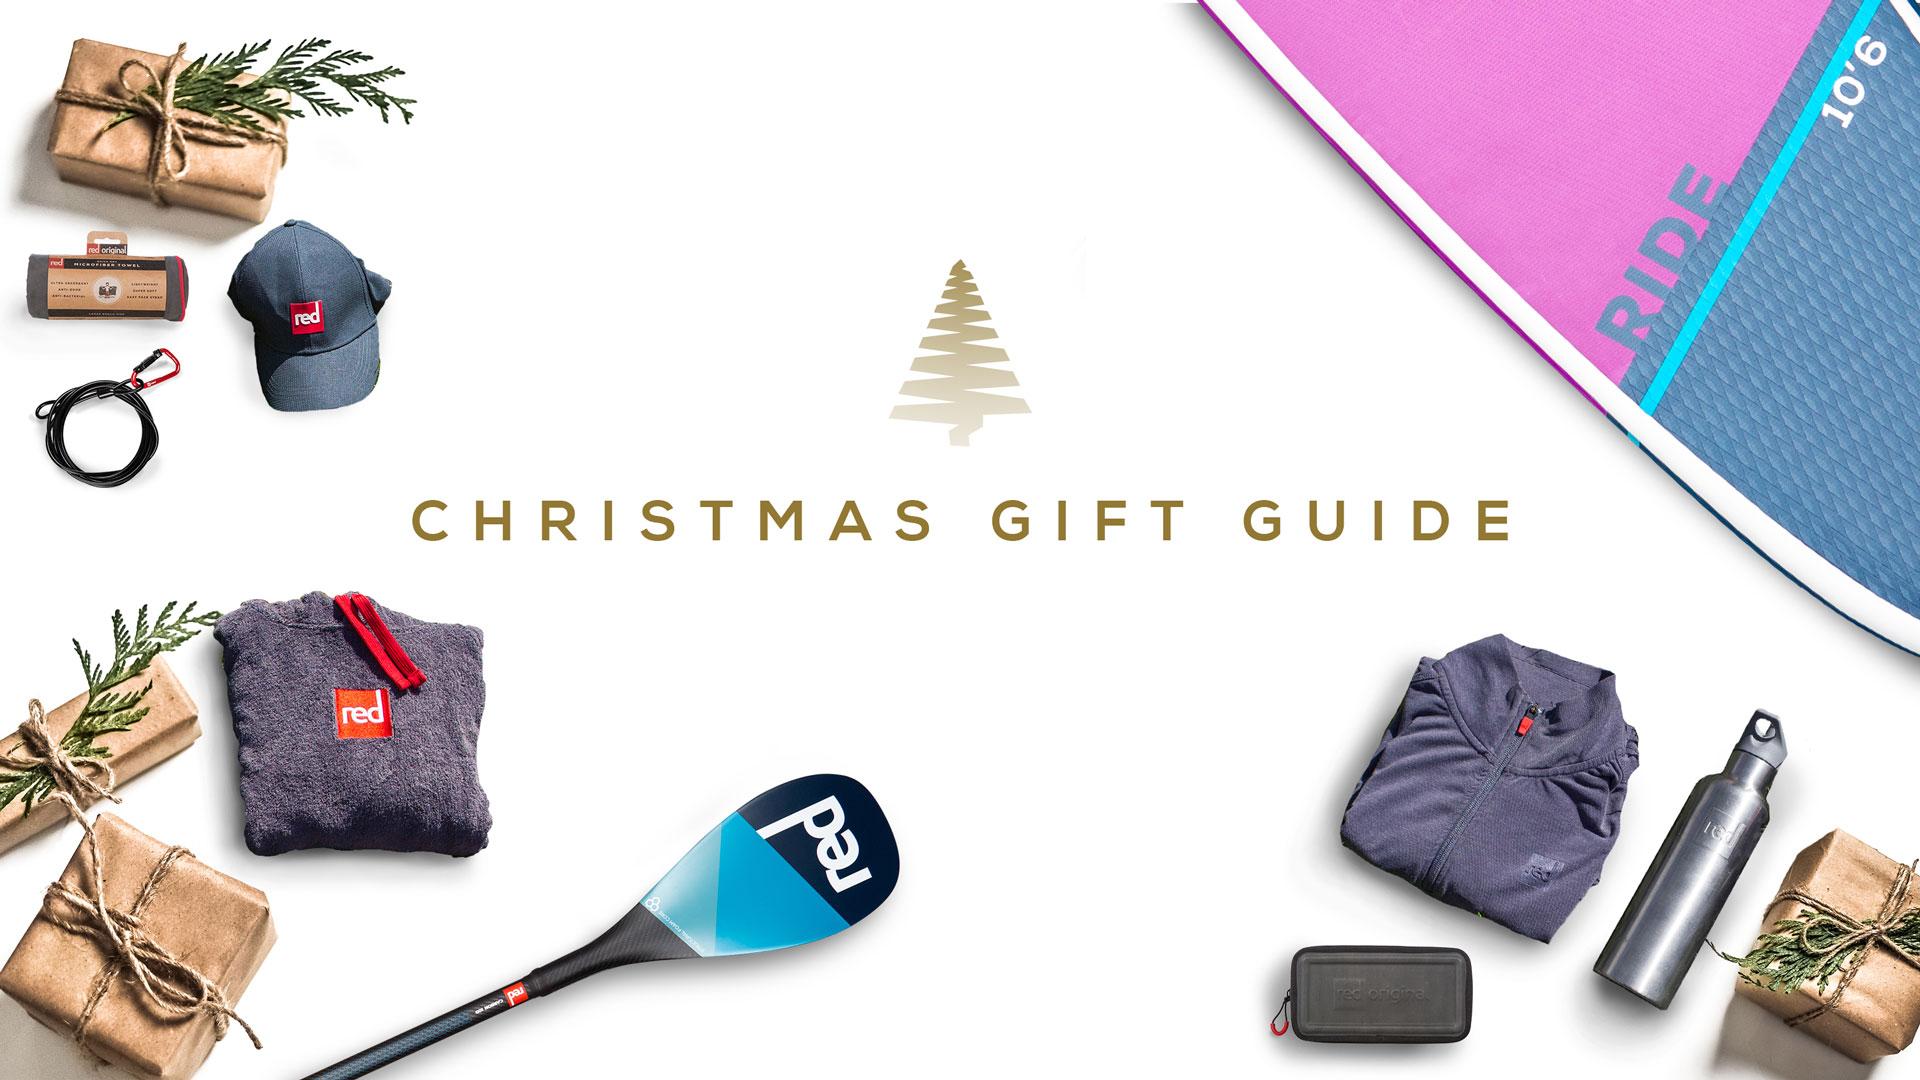 xmas gift guide desktop 2021